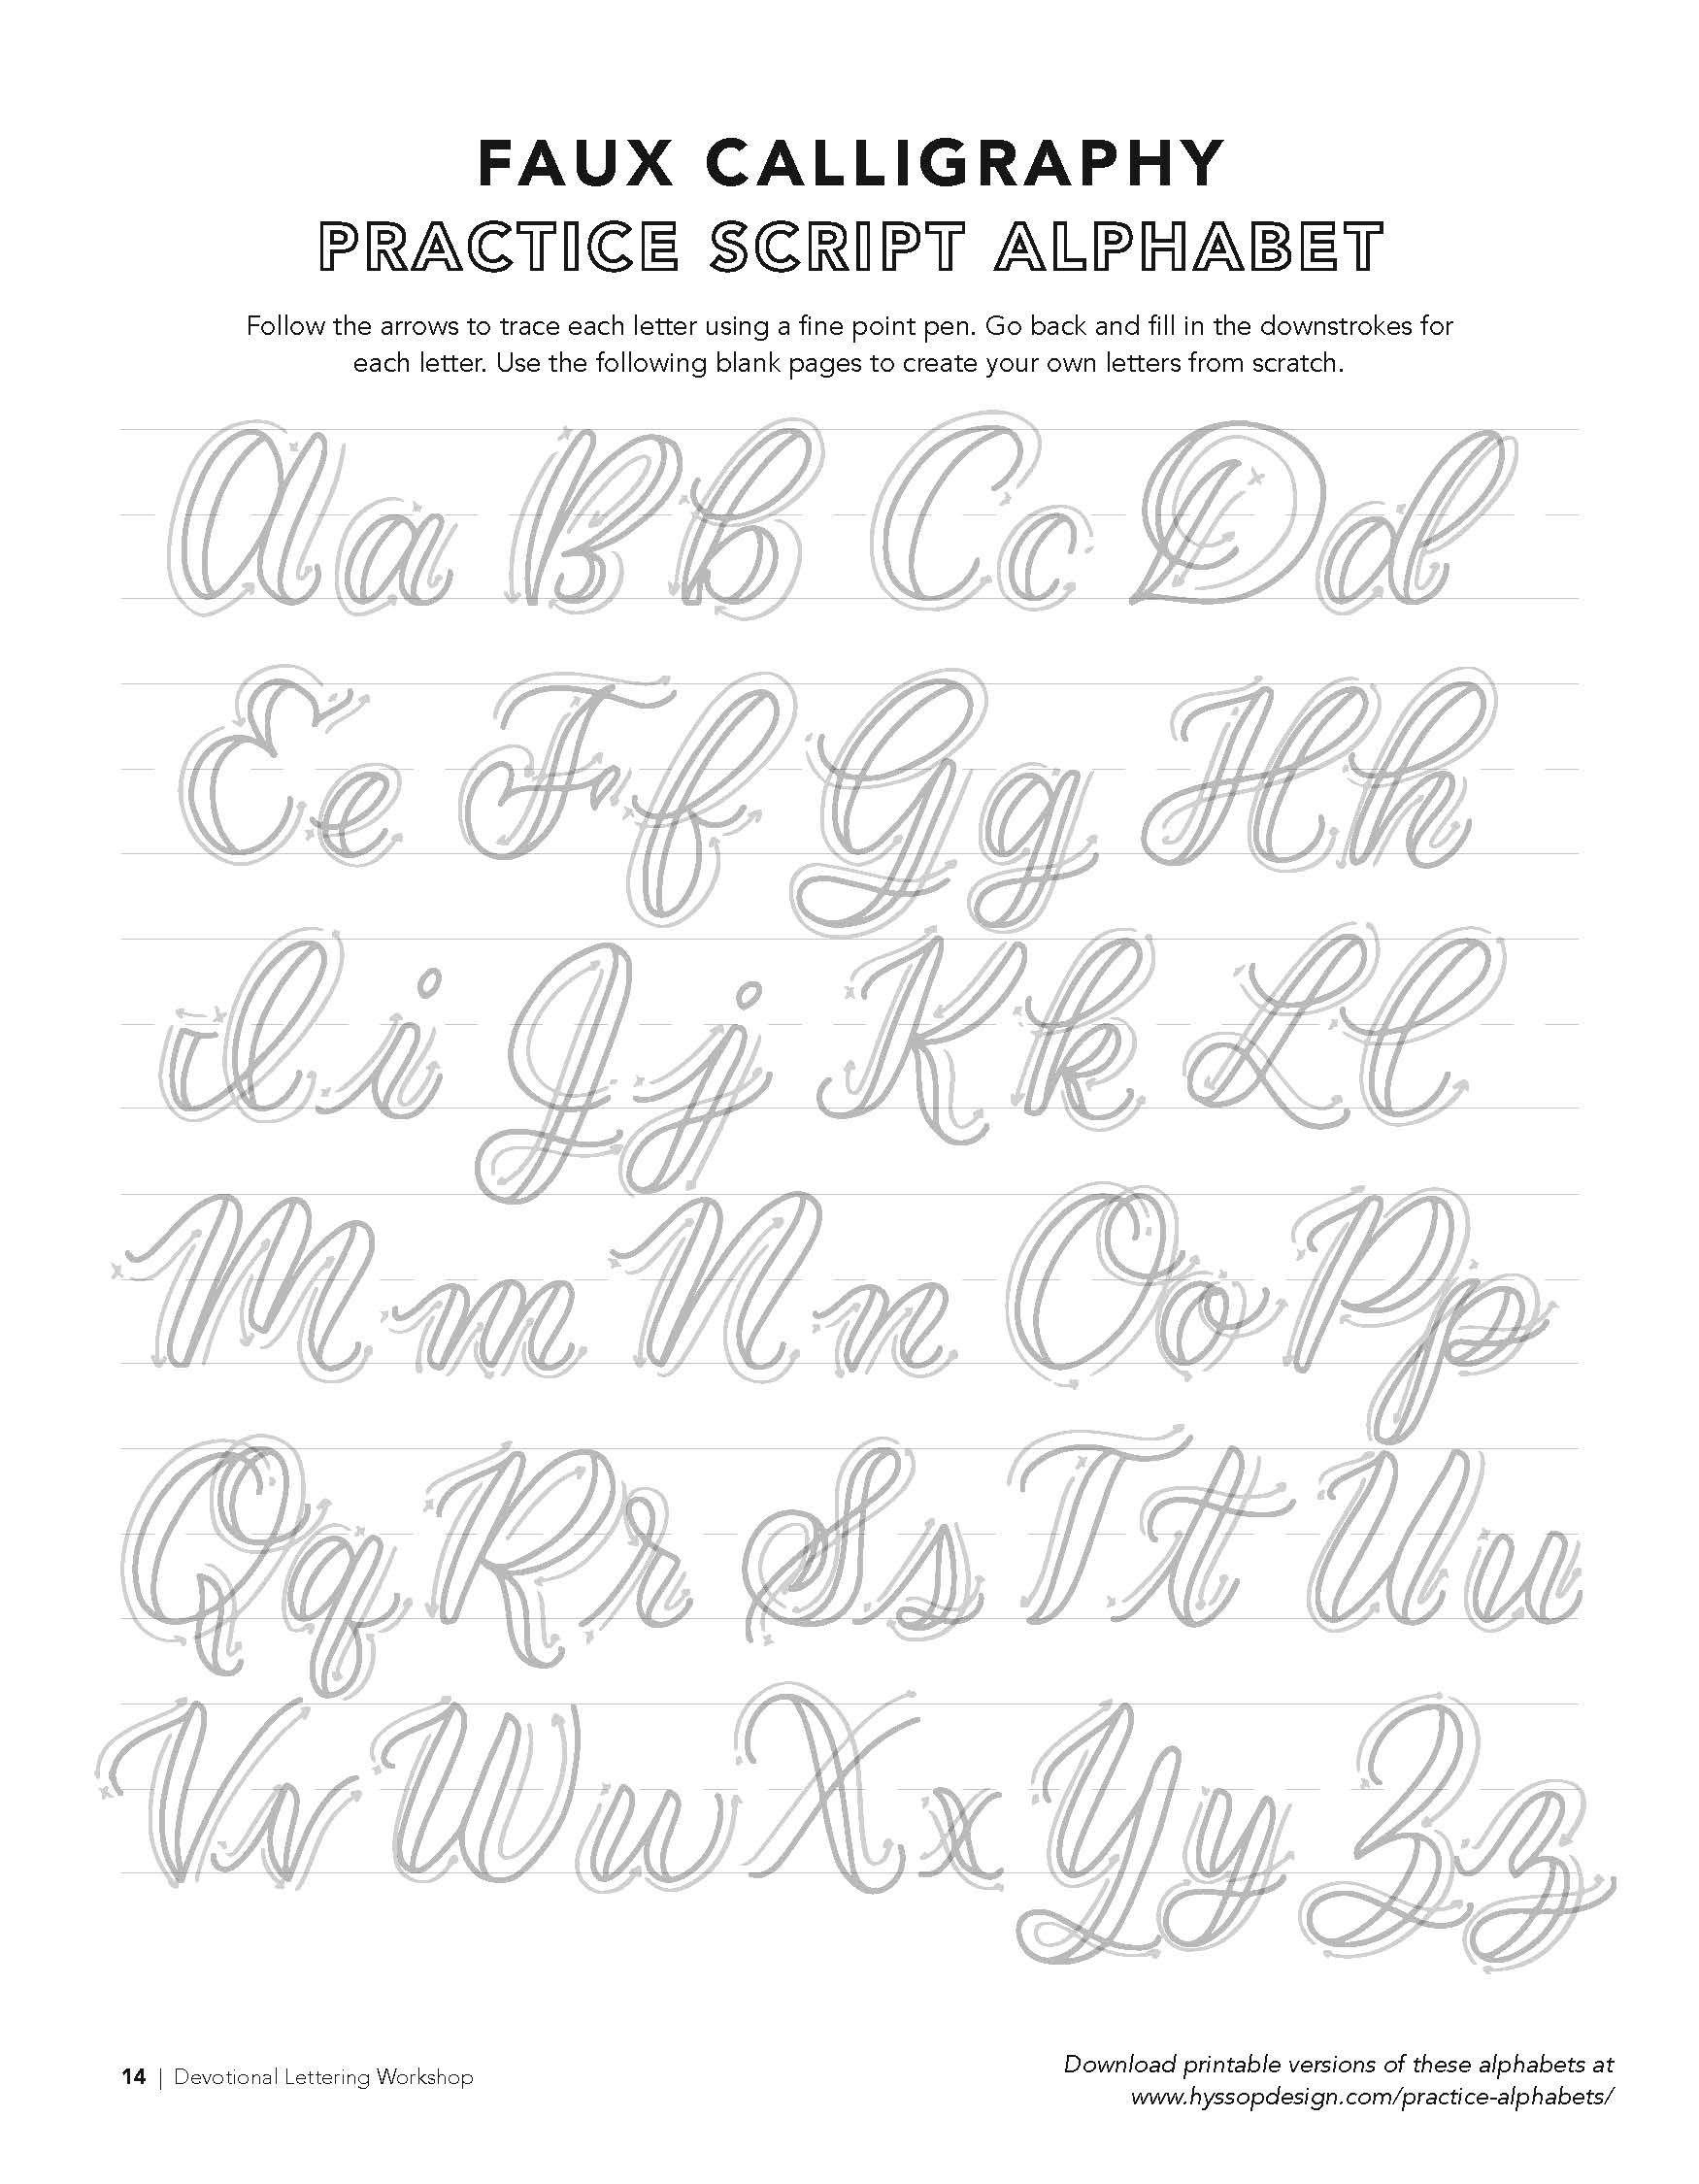 Free Calligraphy Alphabets Jacy Corral Lettering Alphabet